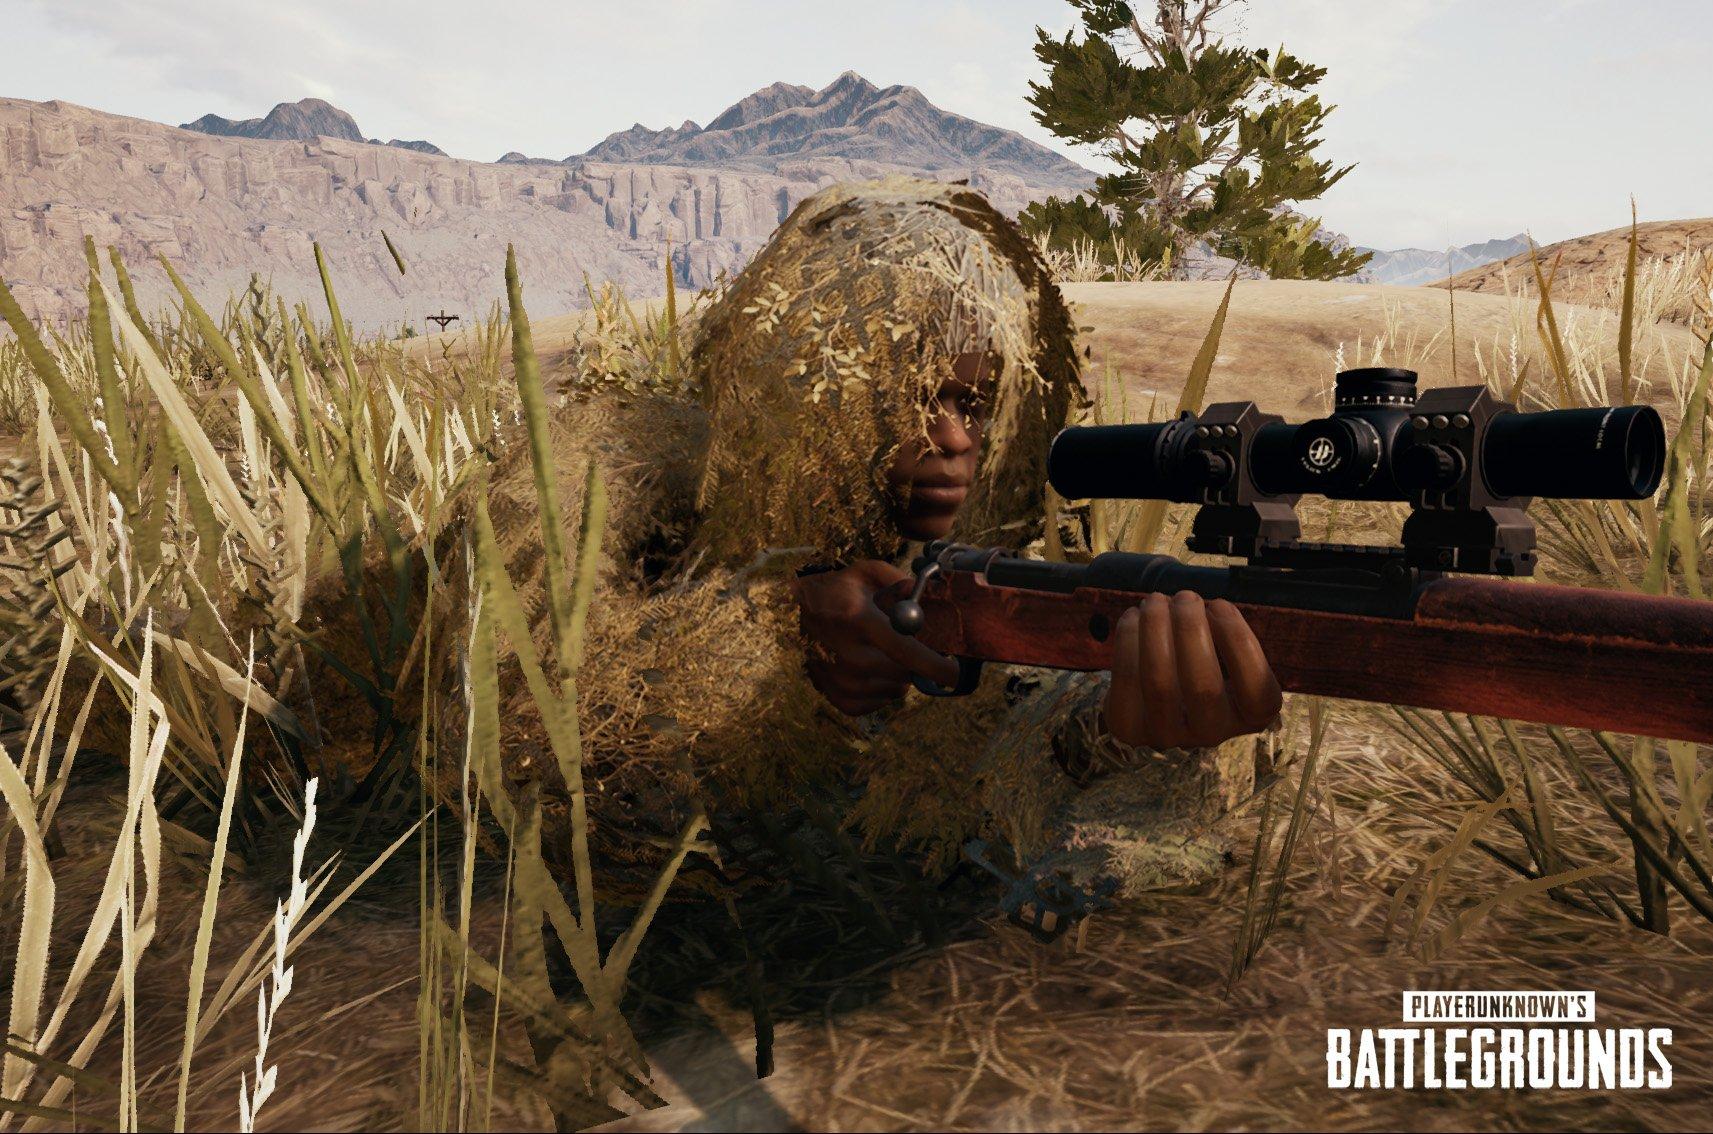 PlayerUnknownu0027s Battlegrounds Miramar Desert Map Now Available On Test  Server Alongside Massive Patch   VG247